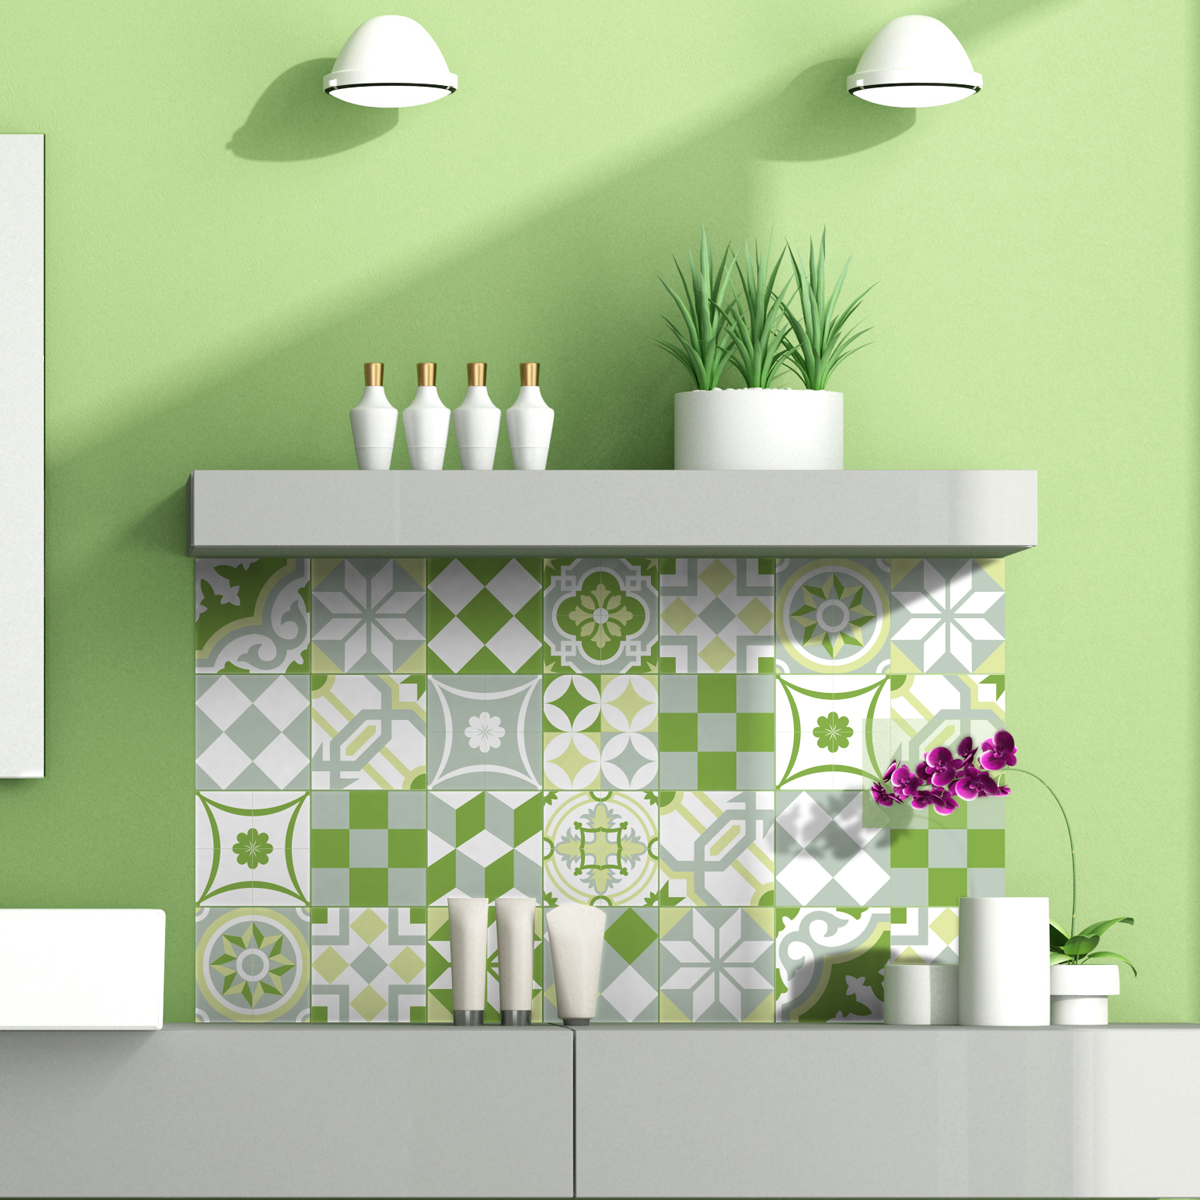 24 stickers carrelages ornements verdoyant art et design. Black Bedroom Furniture Sets. Home Design Ideas